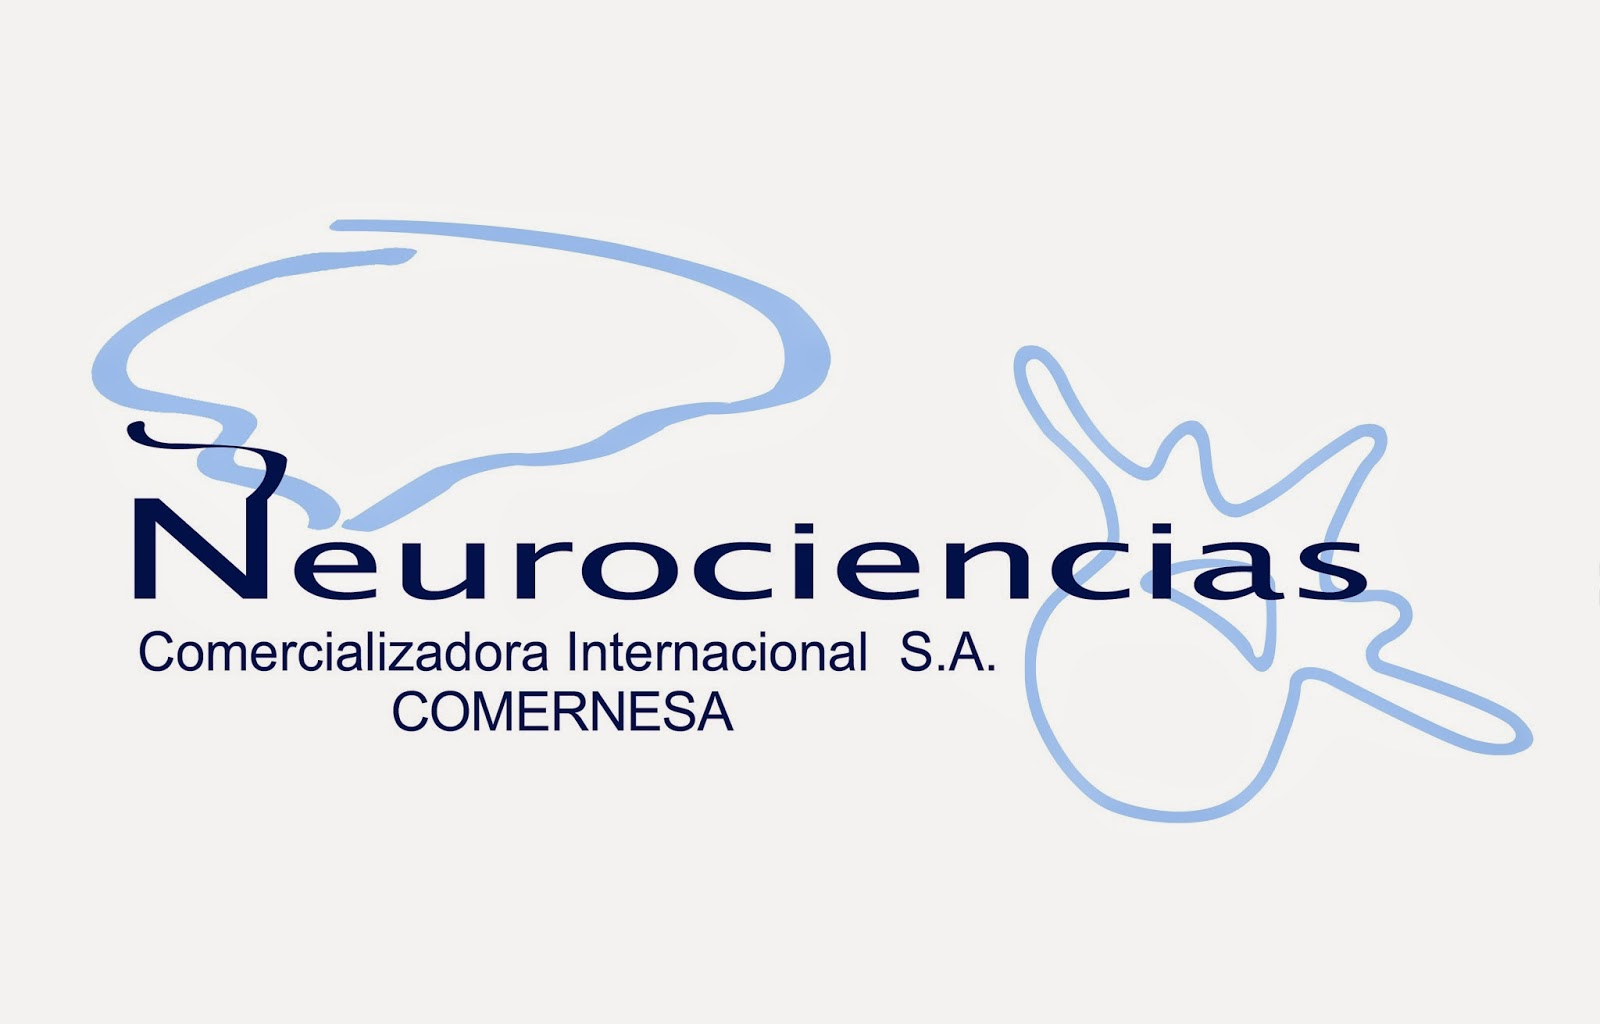 www.comernesa.com